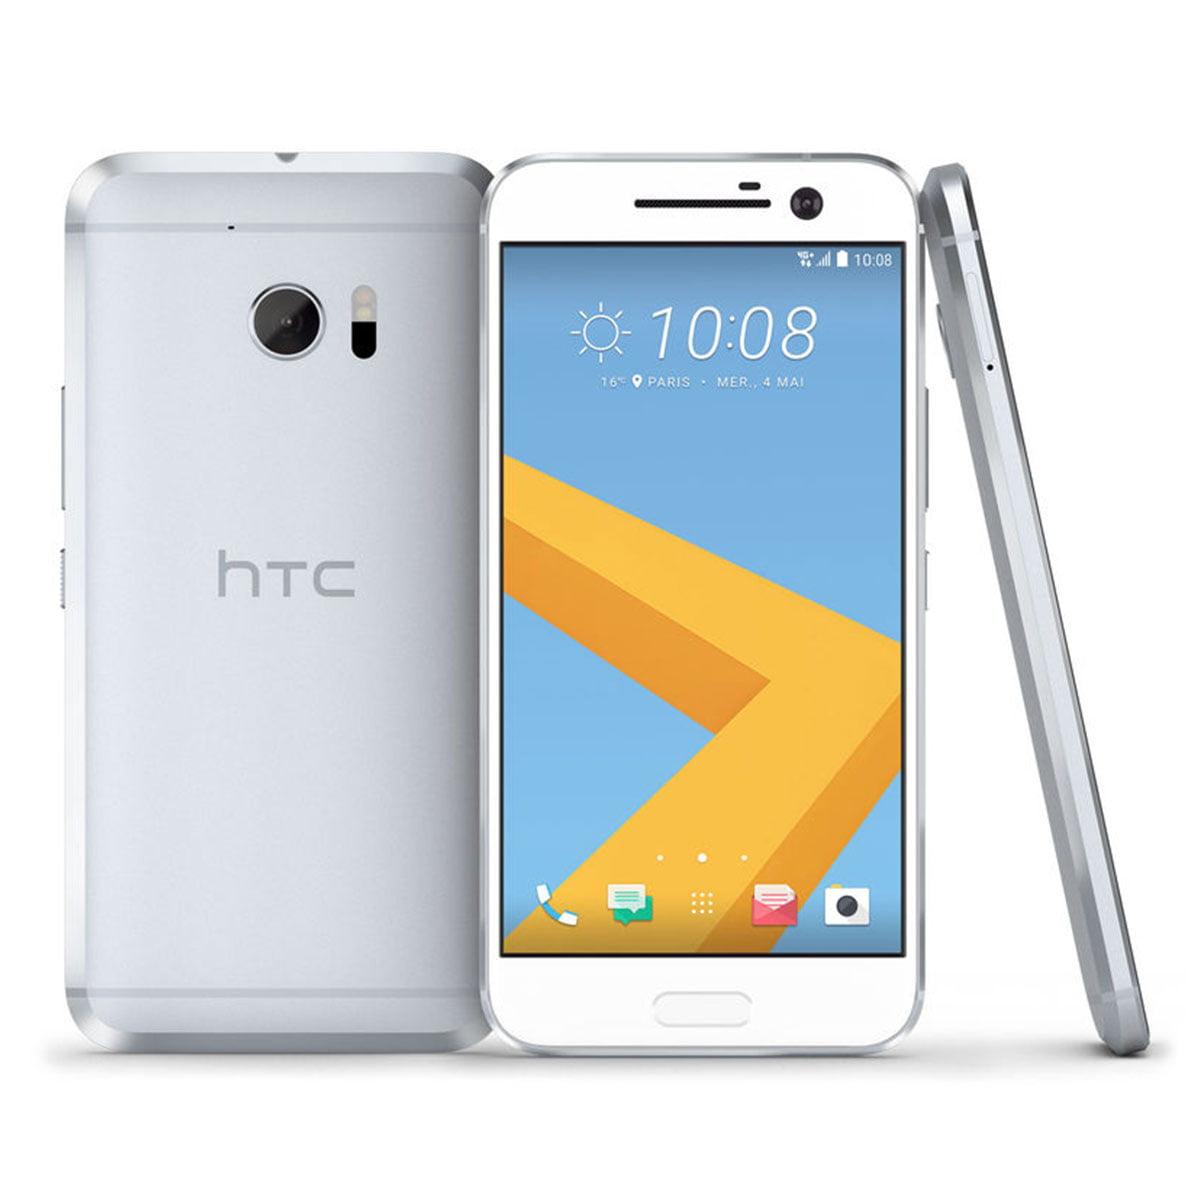 HTC One M10 6545L Glacier Silver 32GB - Verizon and GSM Unlocked (Refurbished)